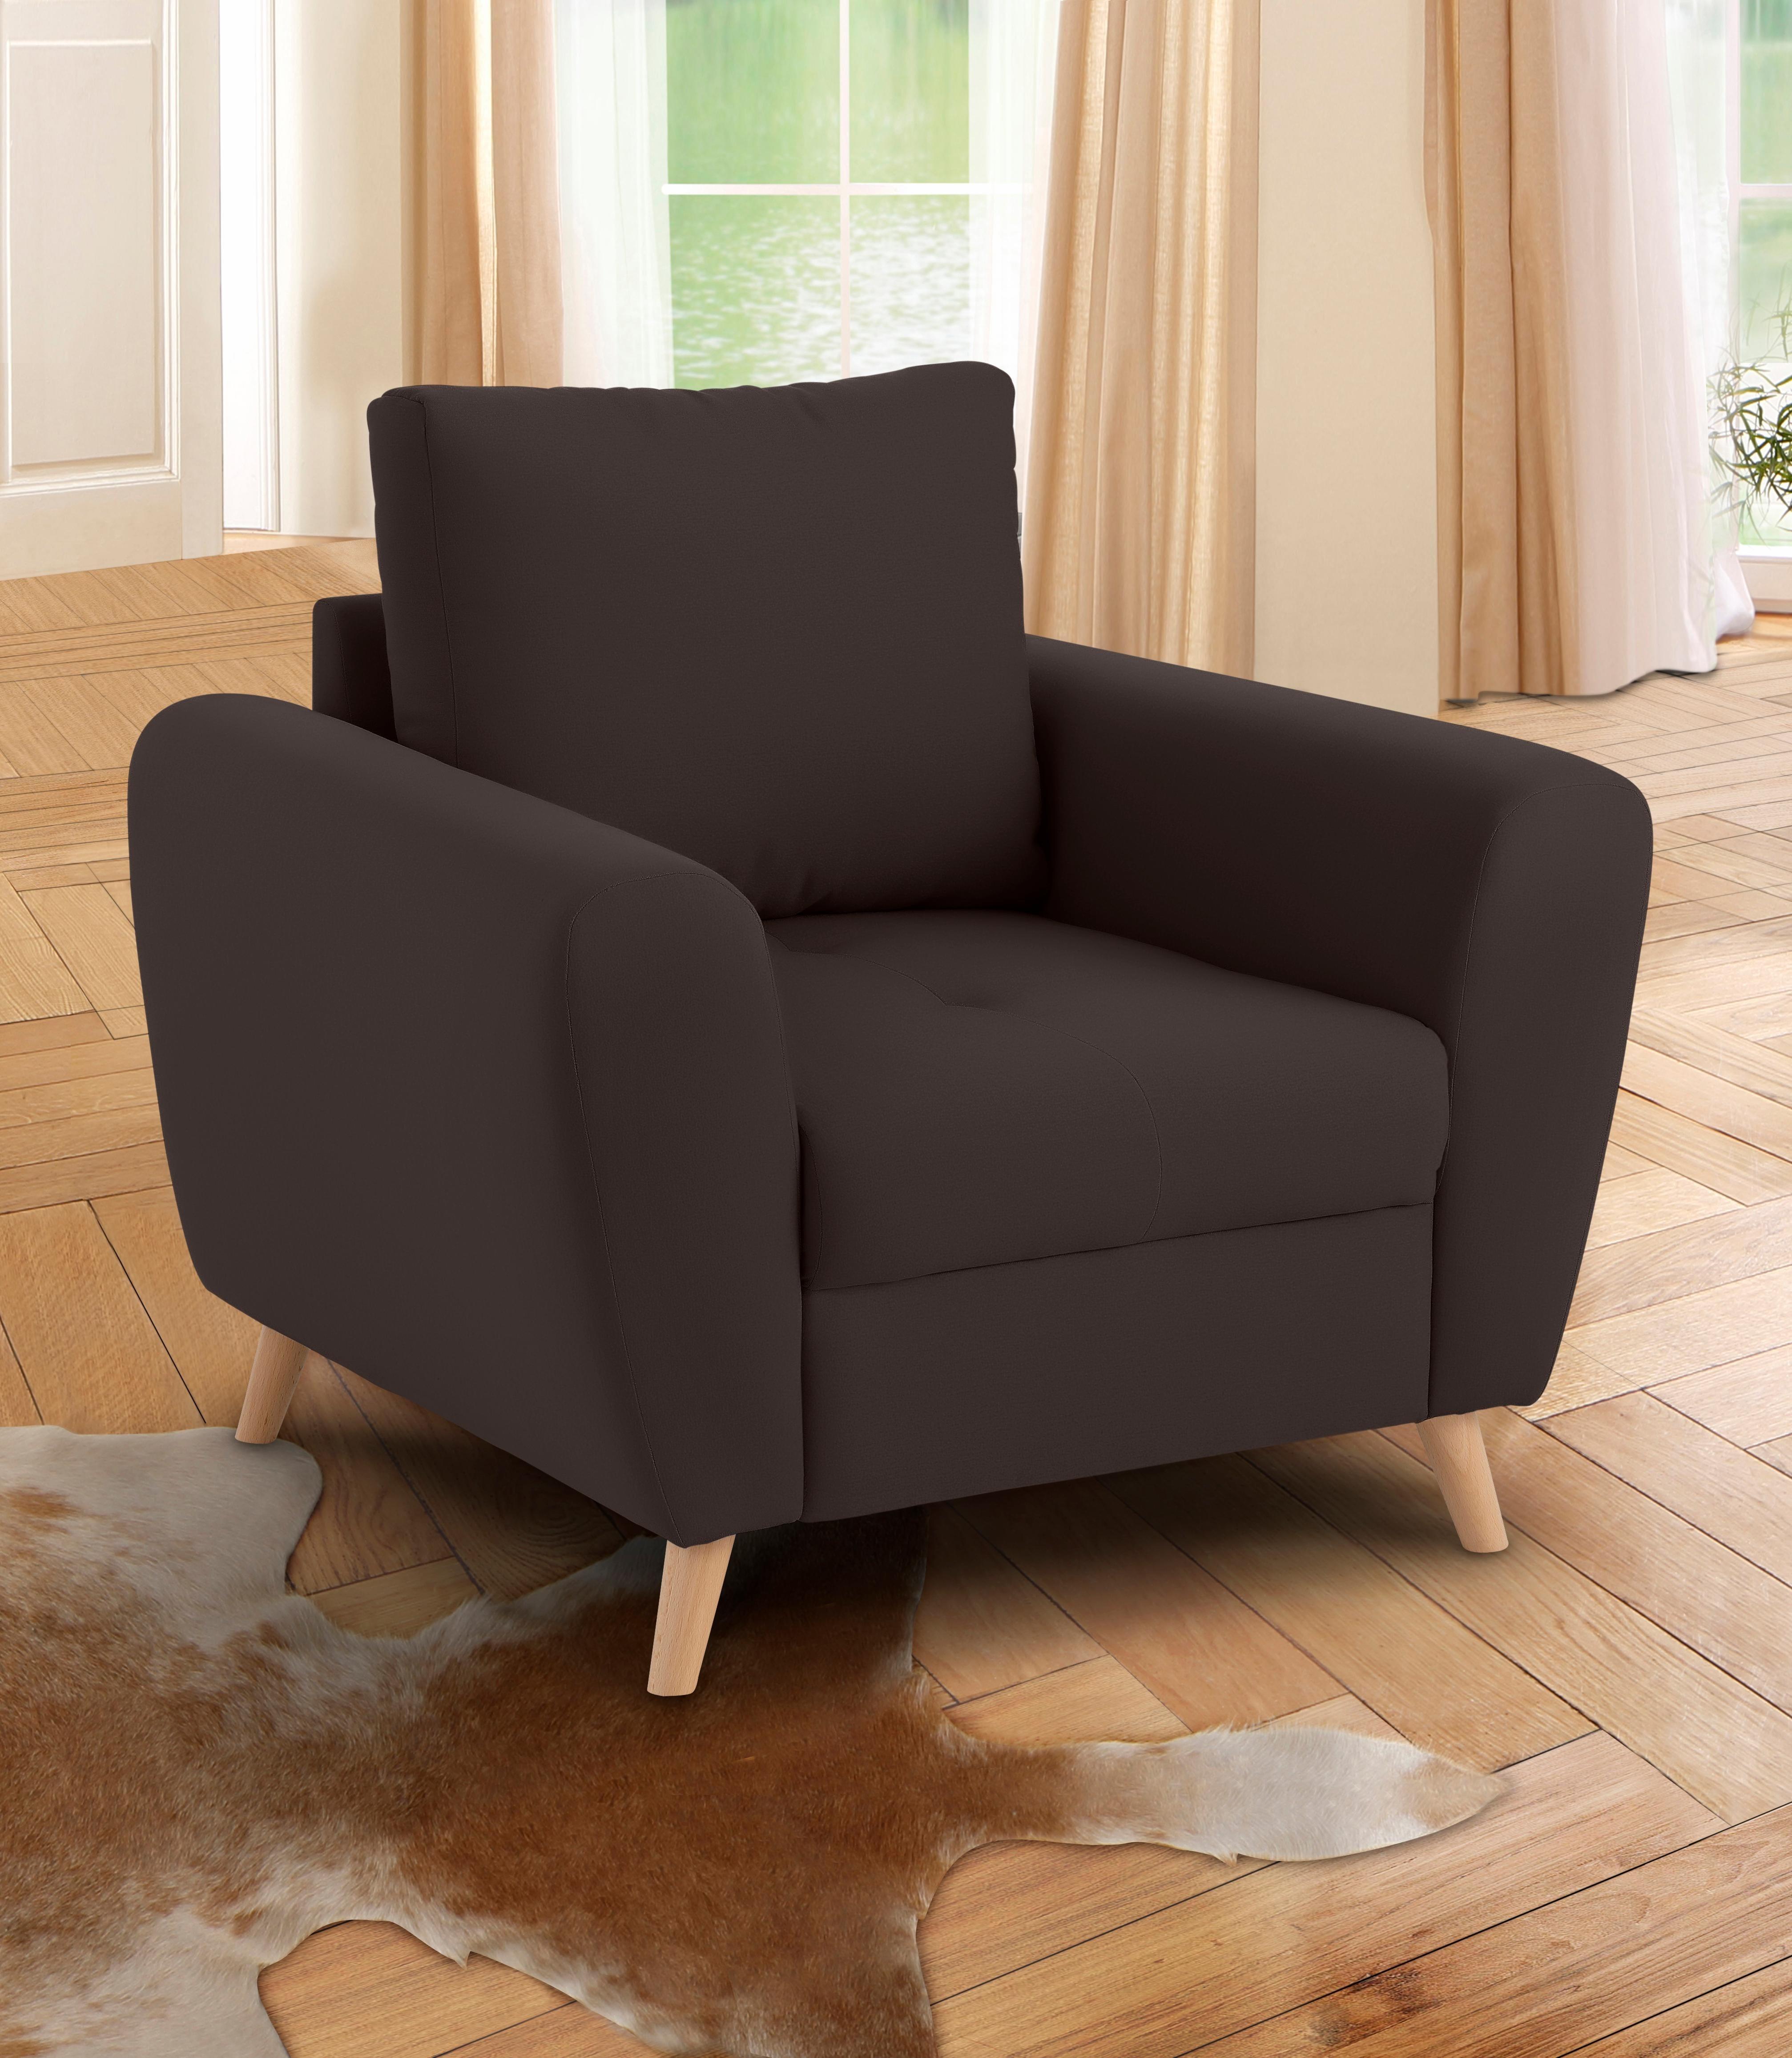 50 sparen home affaire sessel fan nur 269 99 cherry m bel otto. Black Bedroom Furniture Sets. Home Design Ideas